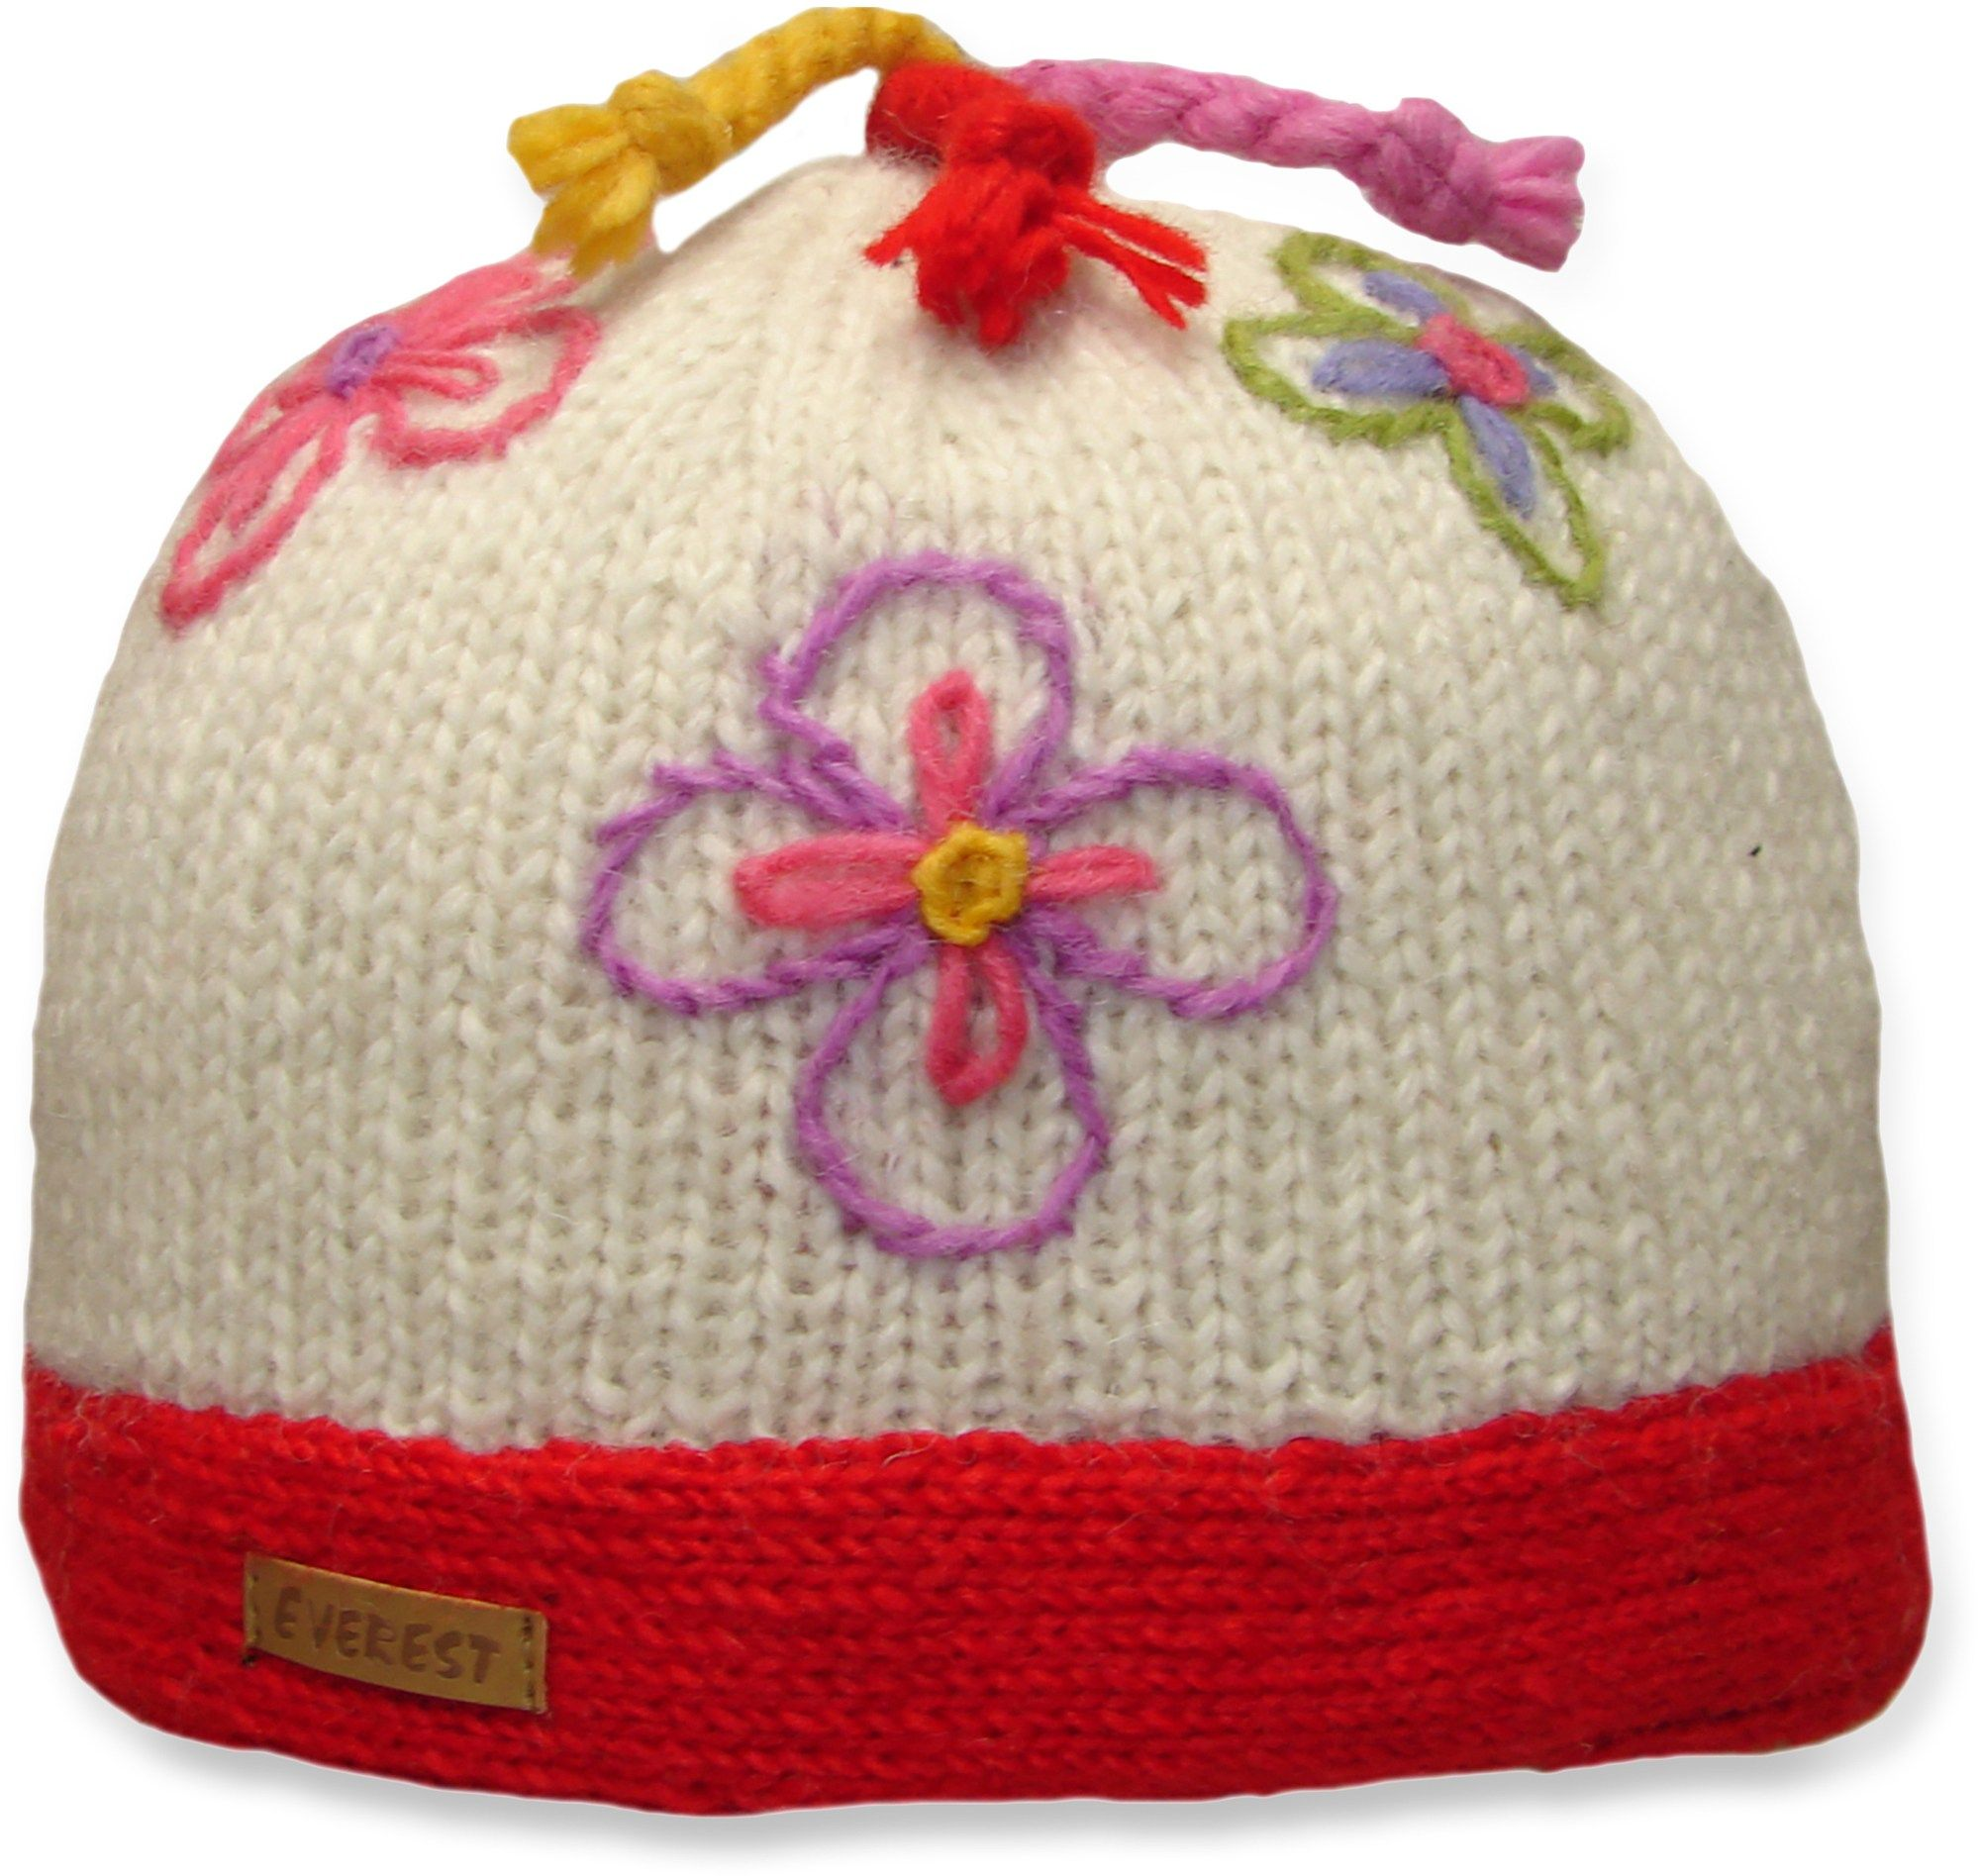 Everest Designs Female Lily Beanie - Girls'